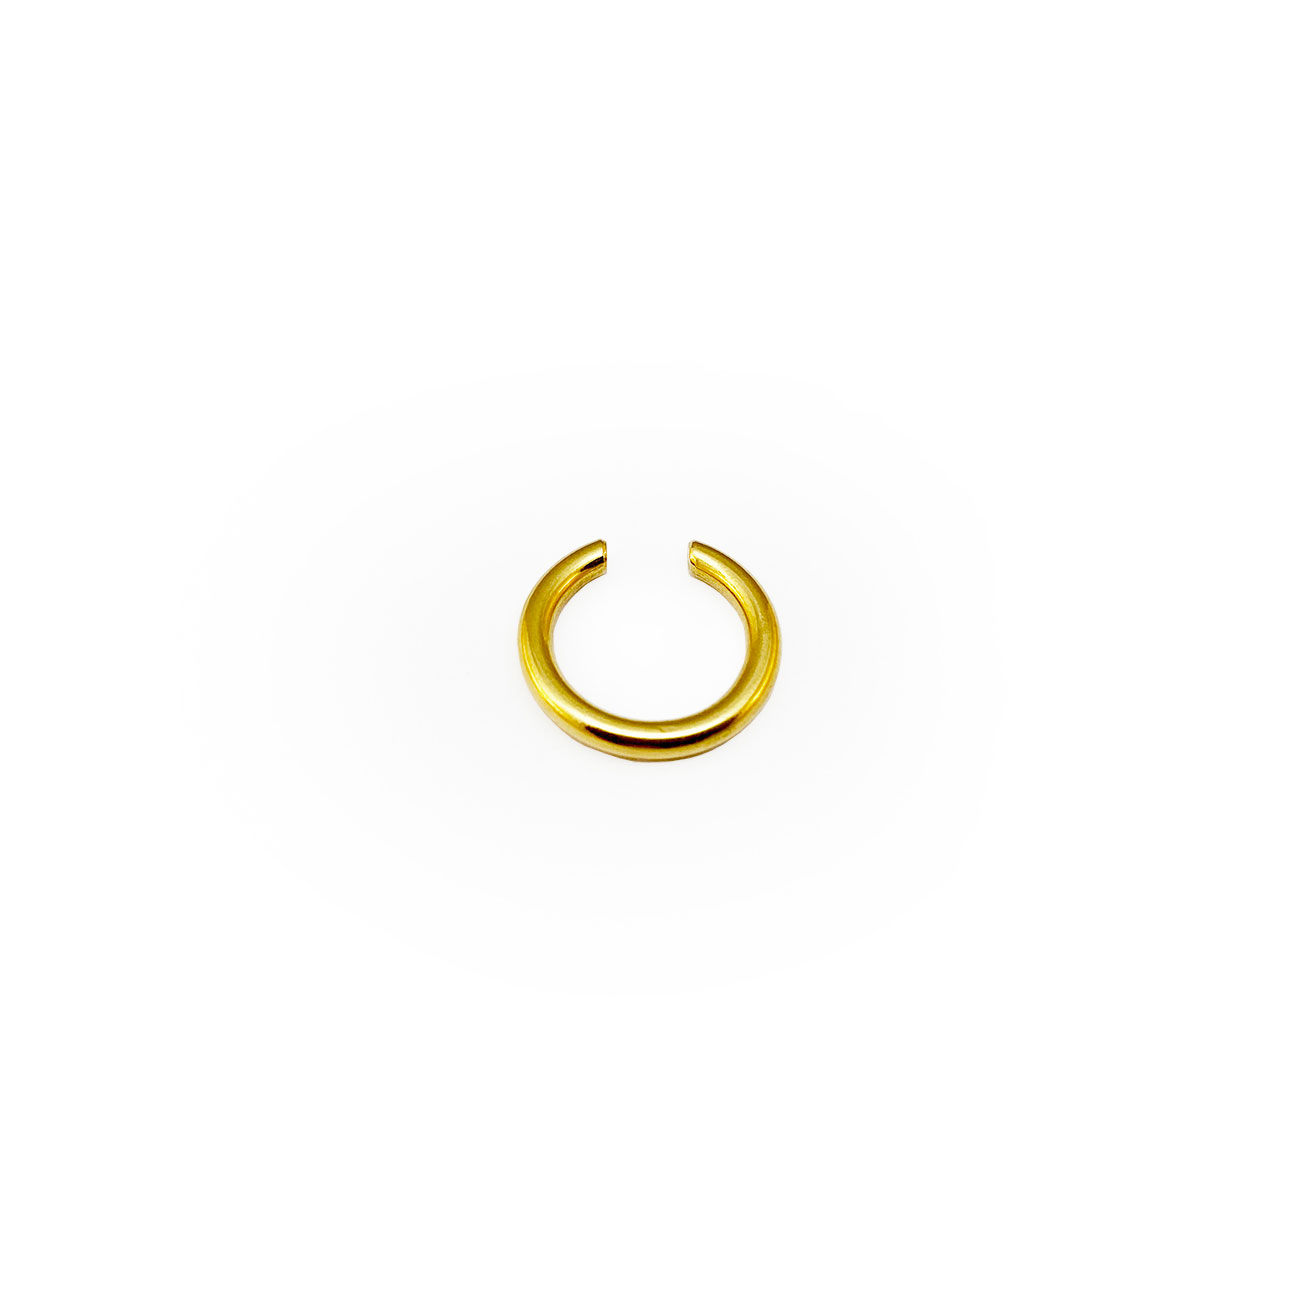 metaformi_design_jewelry_loop_small_golden_ear_cuff